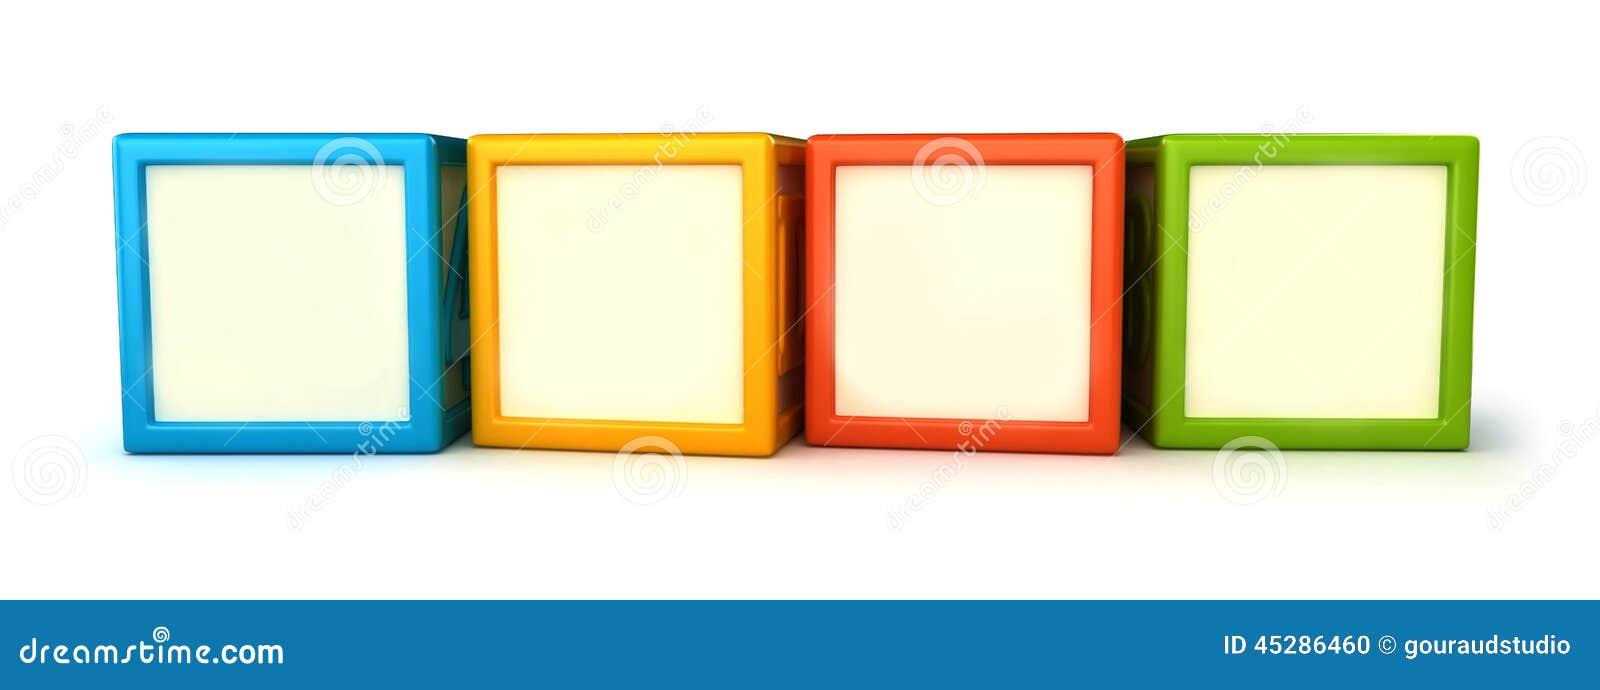 Building Blocks Stock Illustration - Image: 45286460